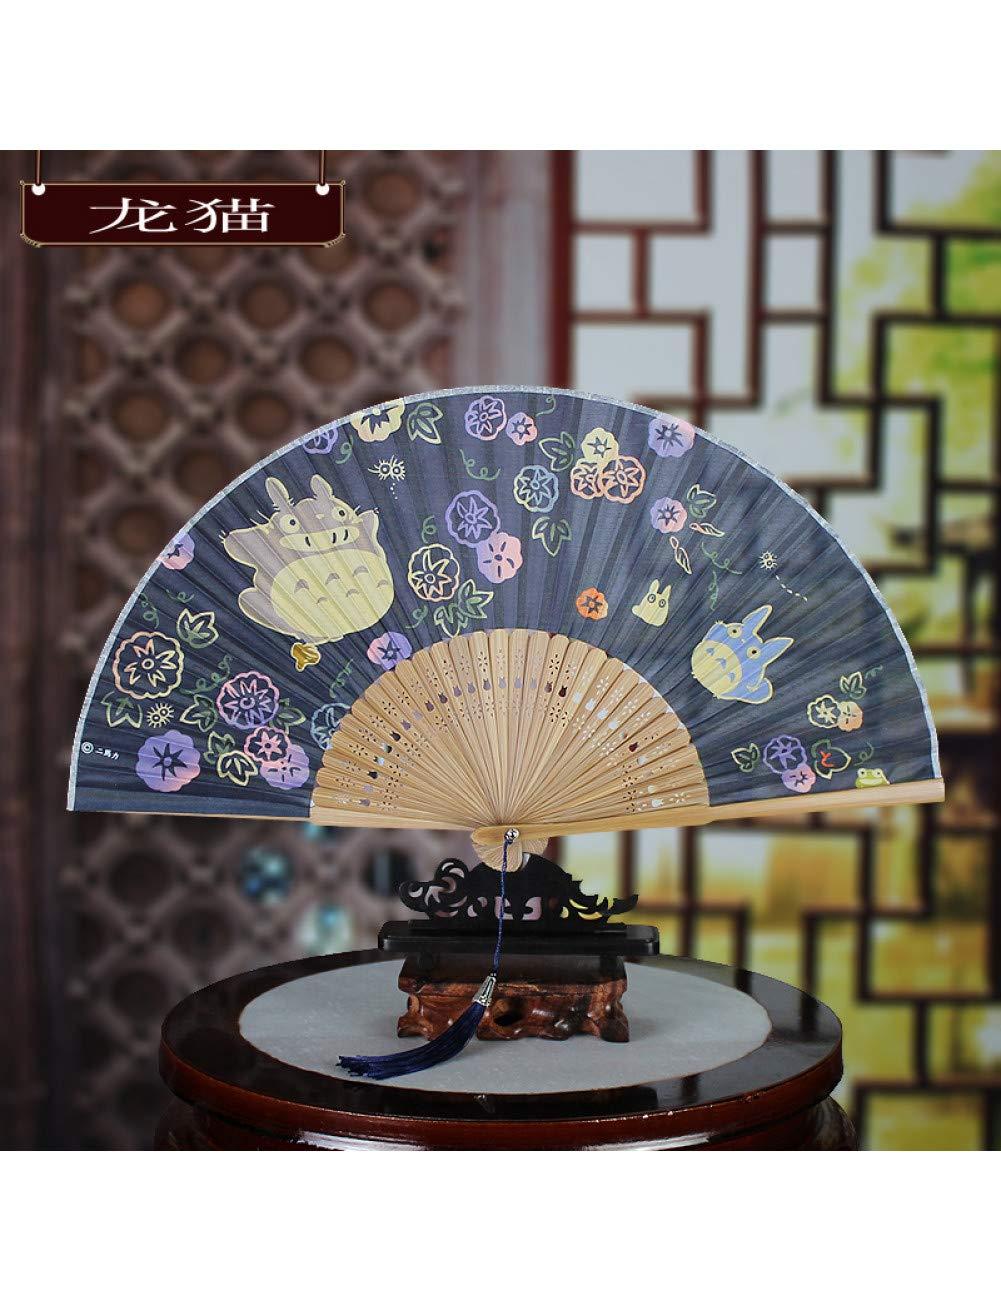 DSFH Ventilateur Pliant Ventilateur Pliant Ventilateur Style Chinois Ancien Vent Classique Ventilateur Pliant Fleurs De Cerisier Pliant Petit Ventilateur